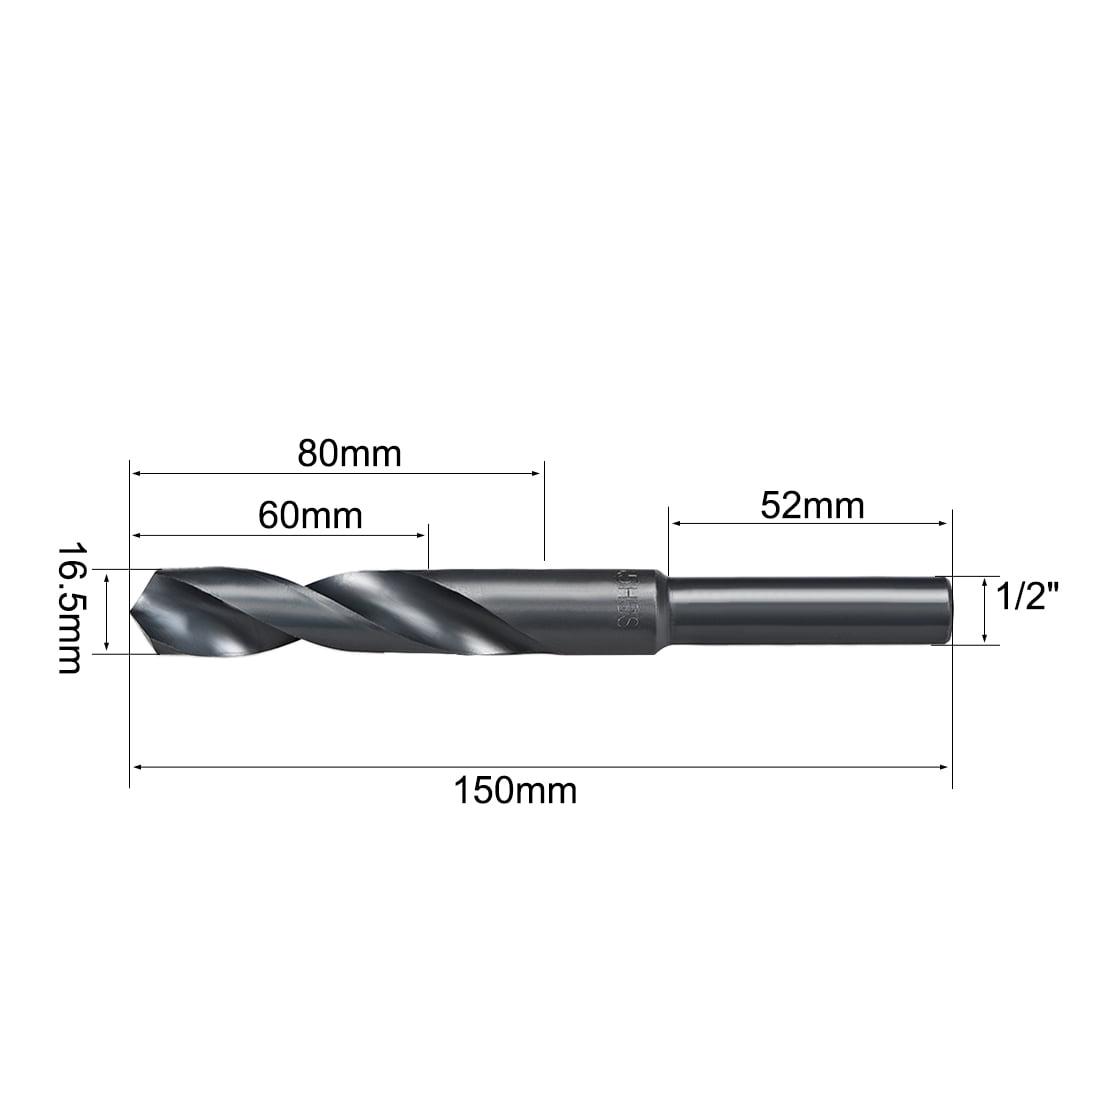 "1/2"" Straight Shank 16.5mm Drill Bit HSS 6542 - image 3 of 4"